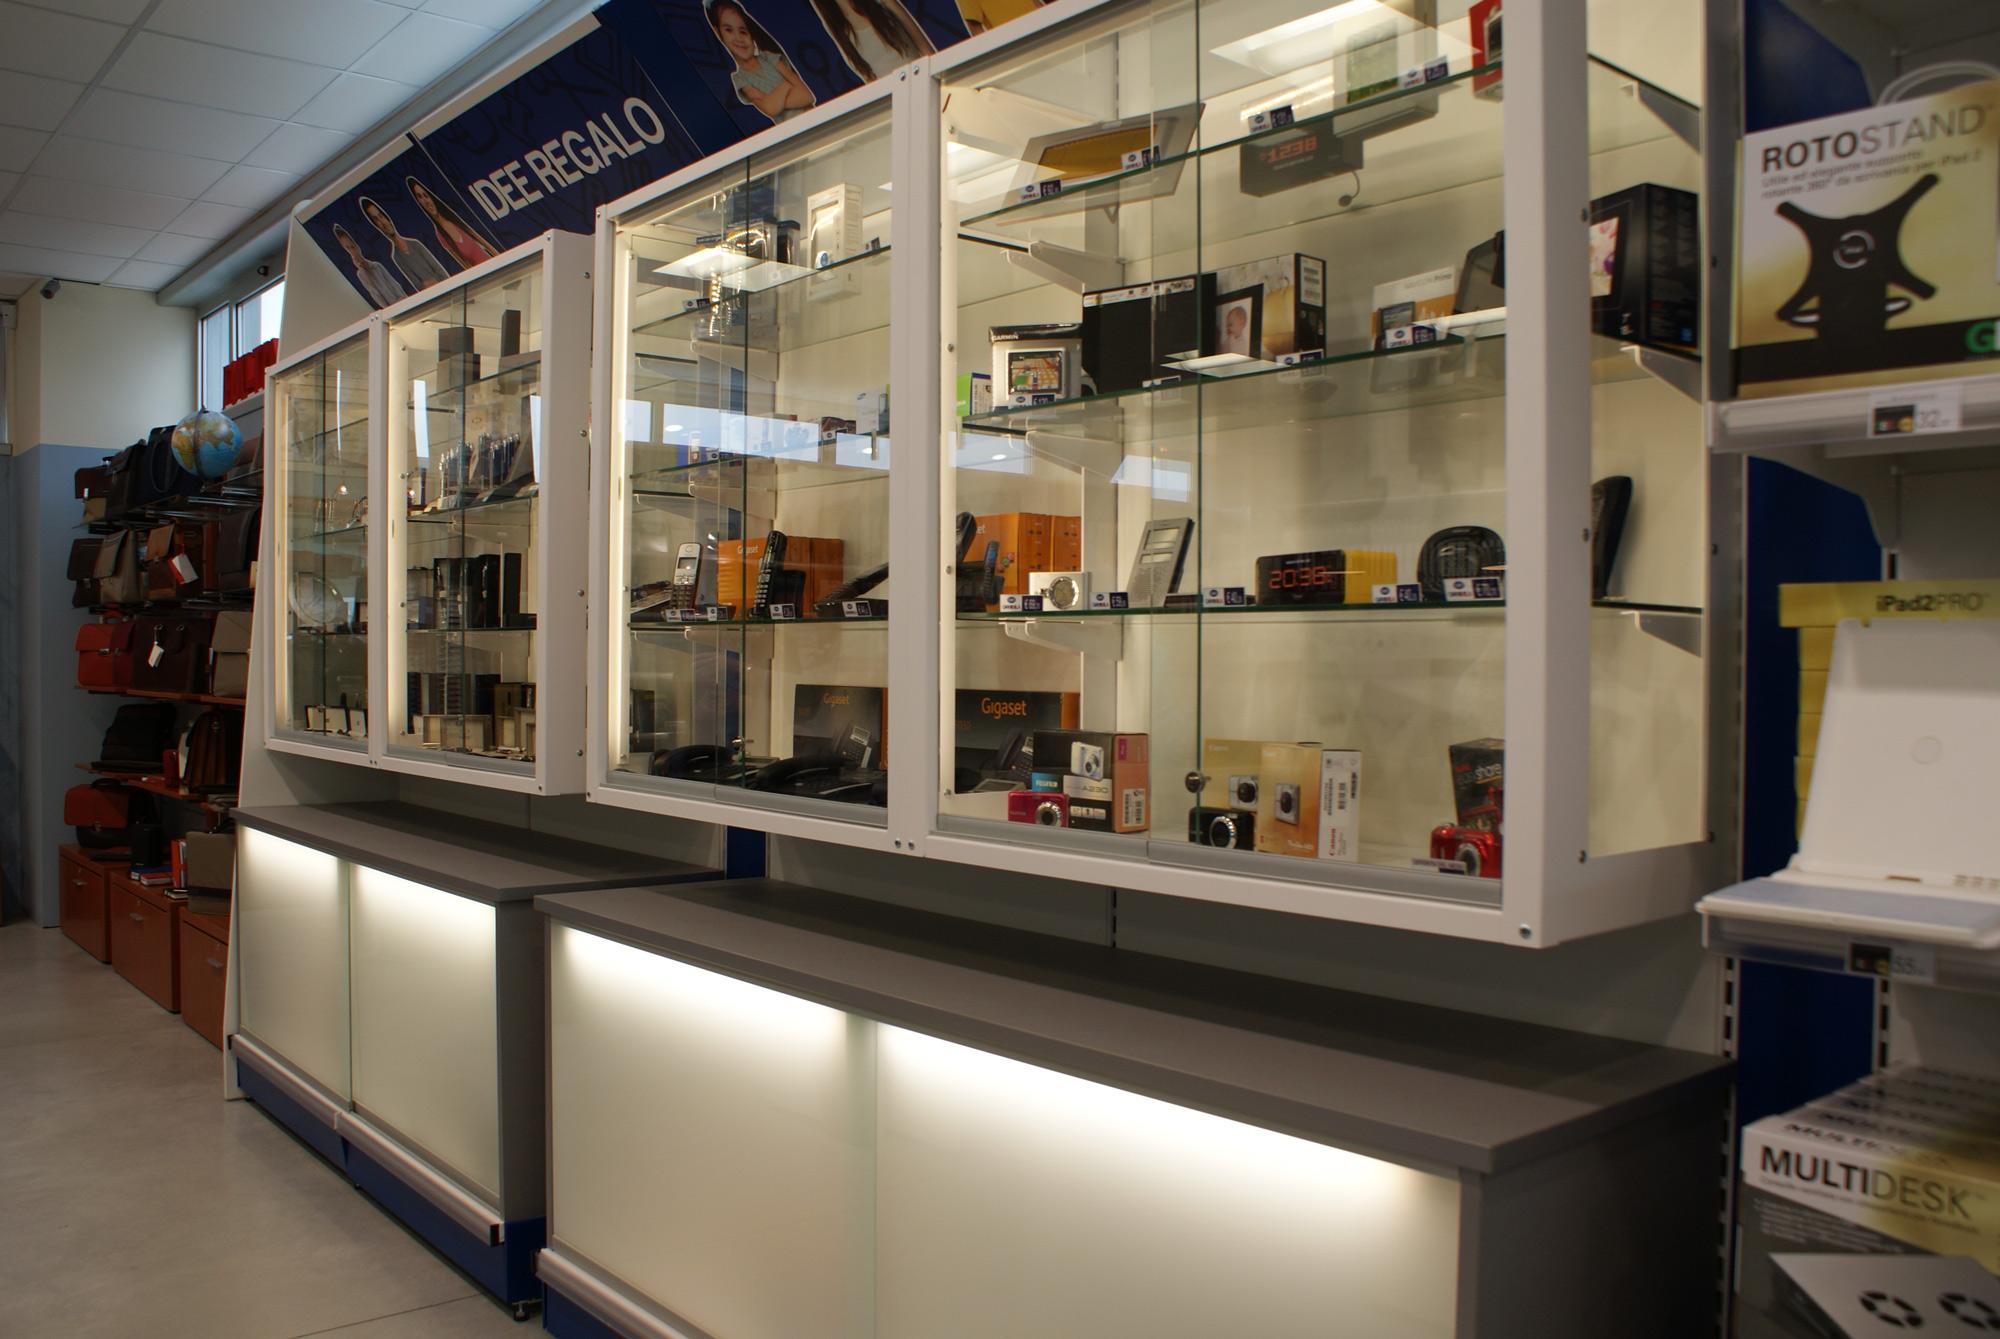 Arredamento per negozi di cartoleria cancelleria toscana for Belardi arredamenti